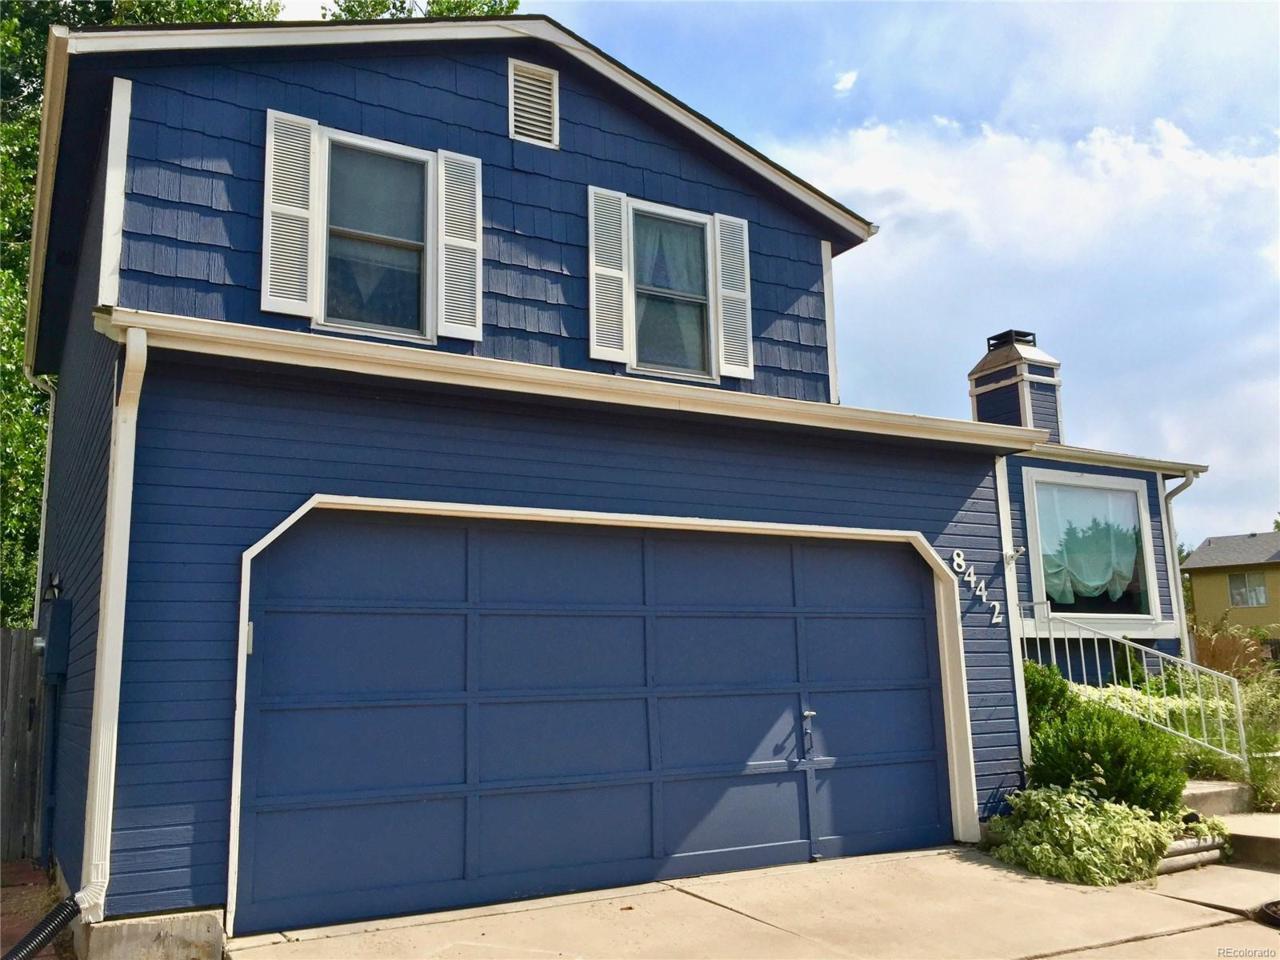 8442 Blazing Star Place, Parker, CO 80134 (MLS #1912759) :: 8z Real Estate